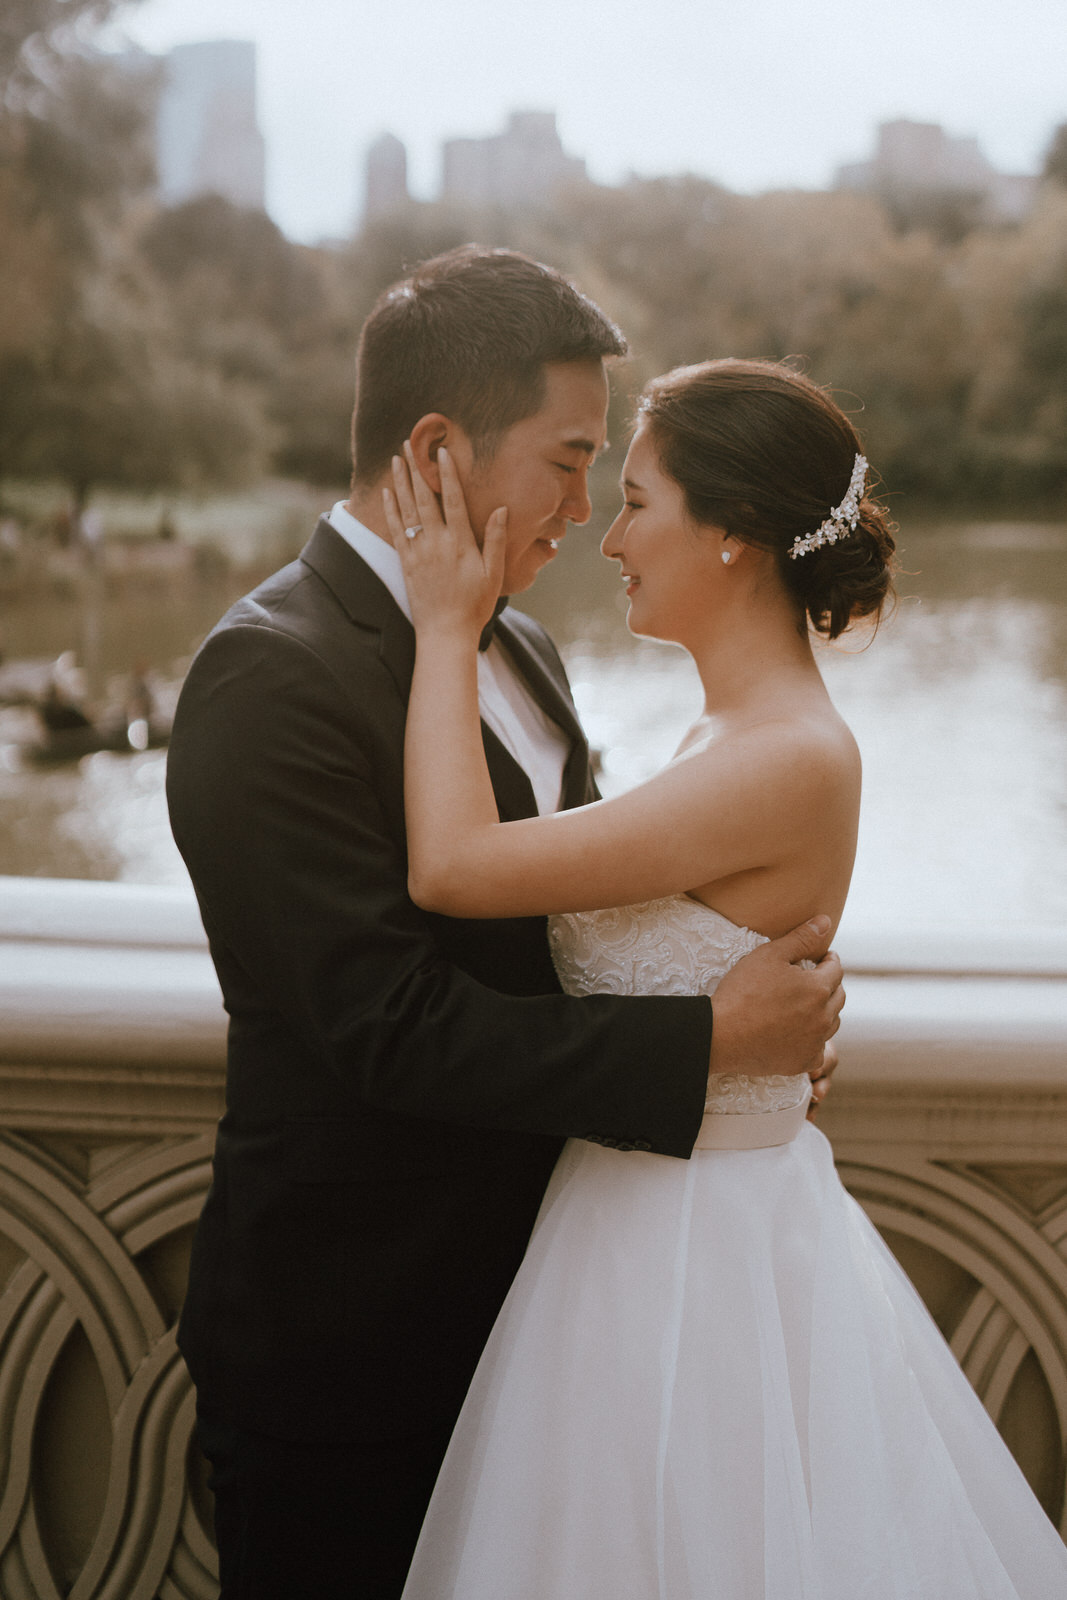 Central Park Elopement Photos-Bow Bridge-Michelle Gonzalez Photography- New York Wedding Photographer-31.jpg